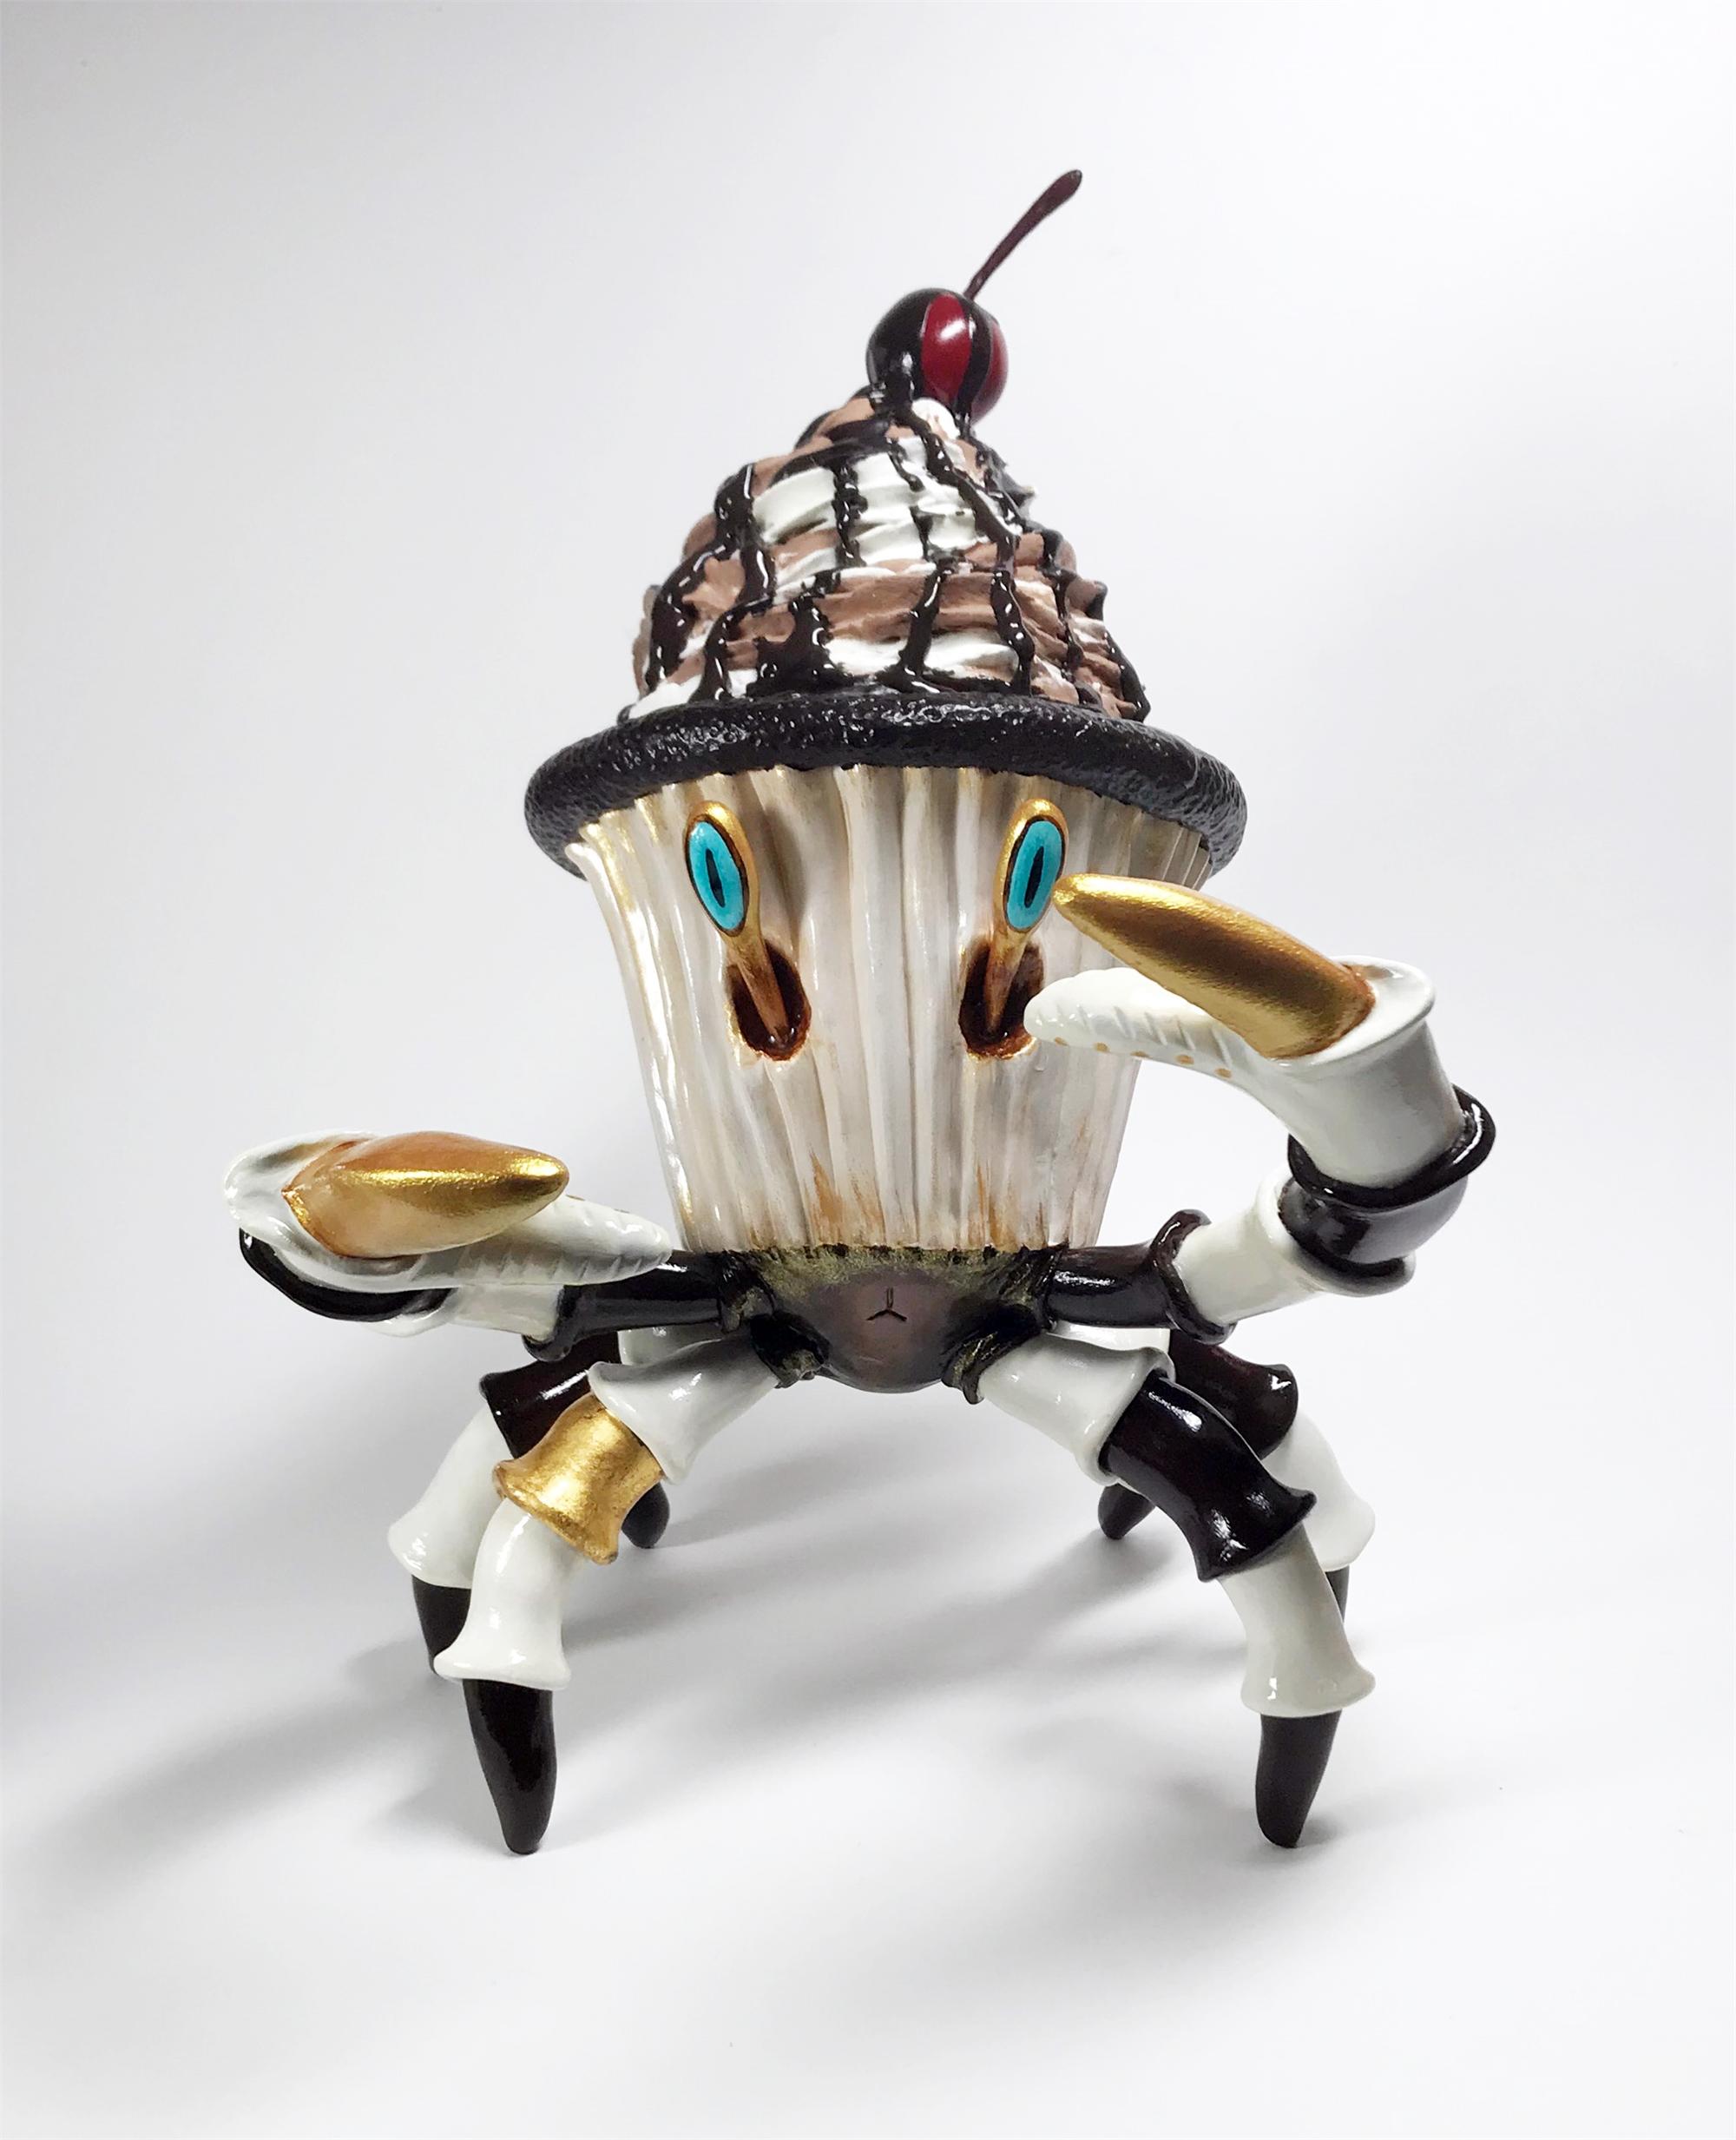 Golden Chocolate Crabcake (Goldie) by Corina St. Martin